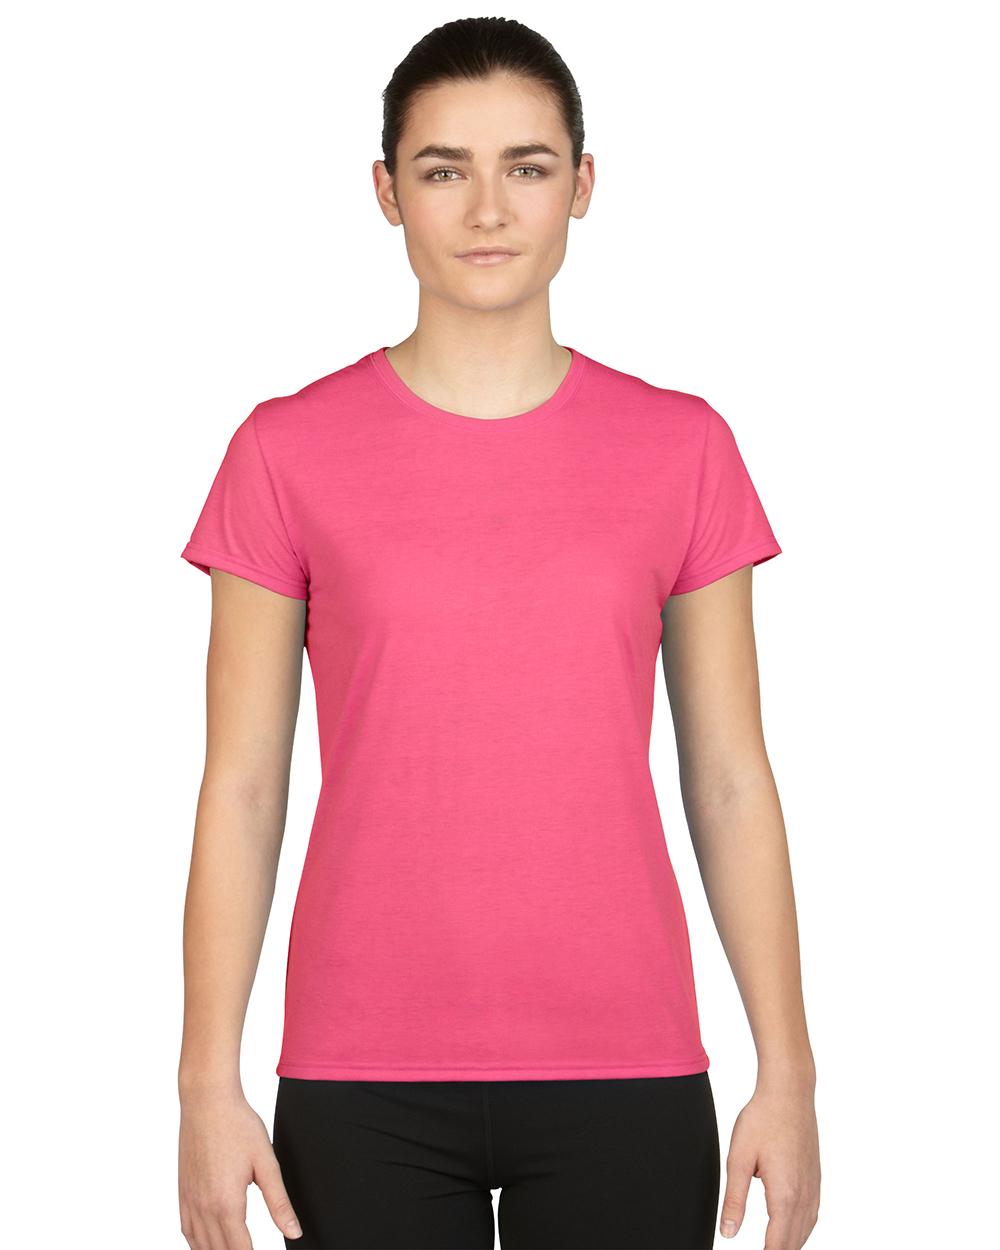 Gildan 42000L     Ladies Performance    4.5 oz. 100% Polyester (Cotton Feel)